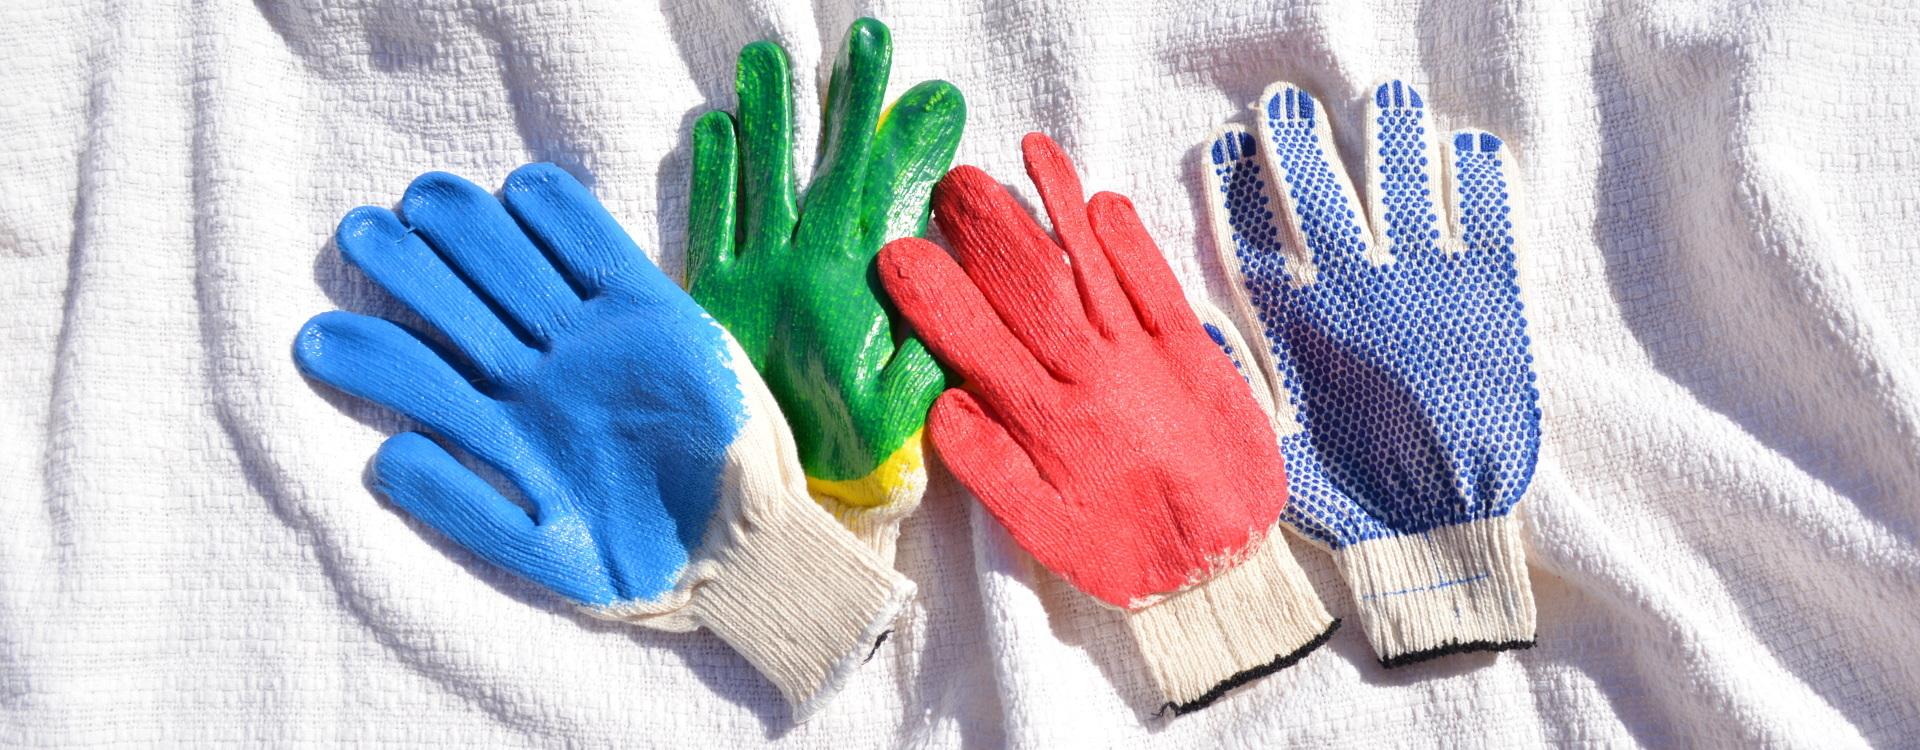 Оптовая продажа х/б перчаток с покрытием ПВХ